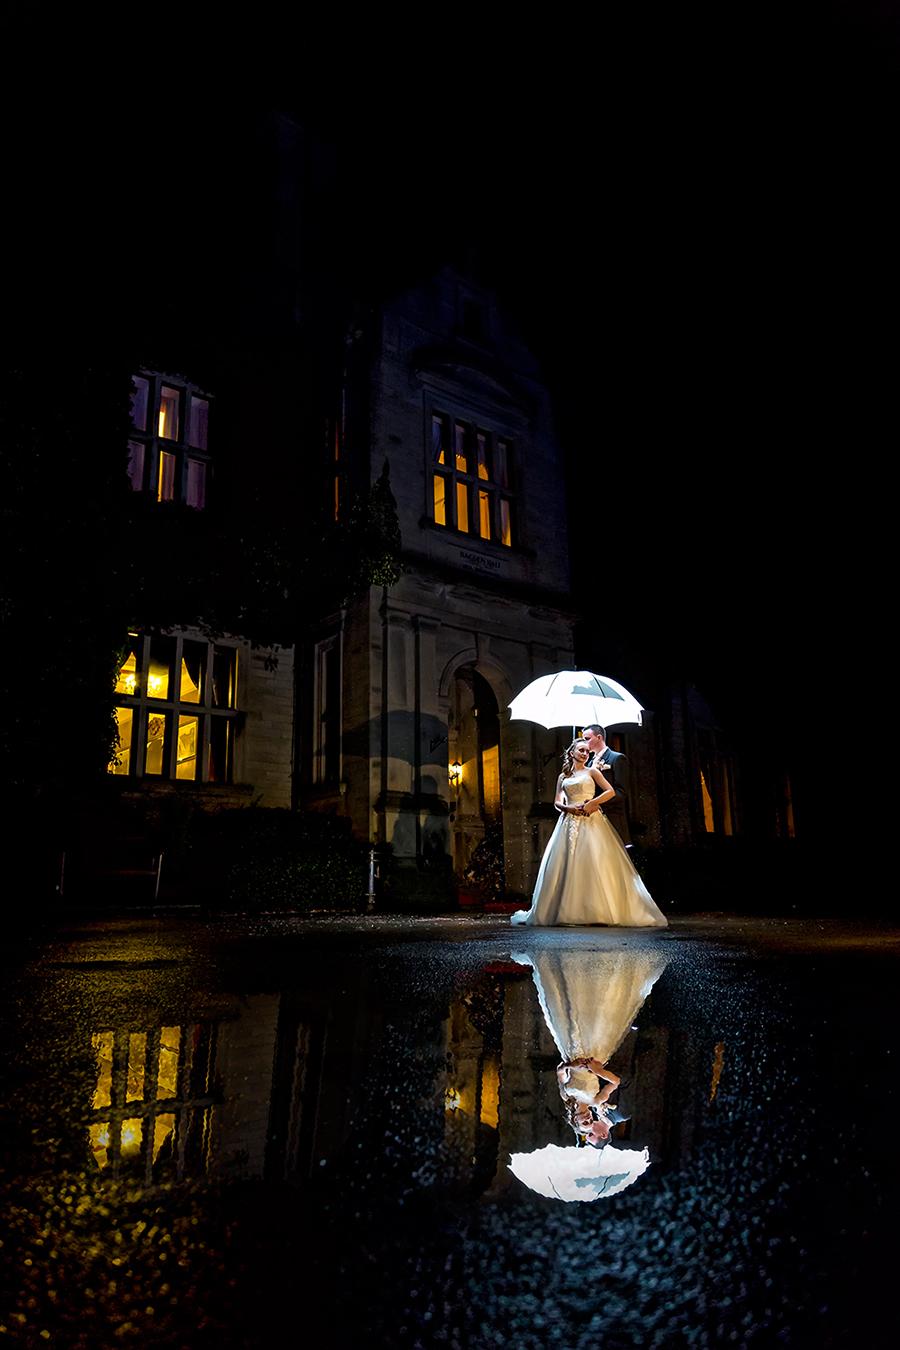 Wedding-&-Portrait-Photography-Huddersfield-West-Yorkshire